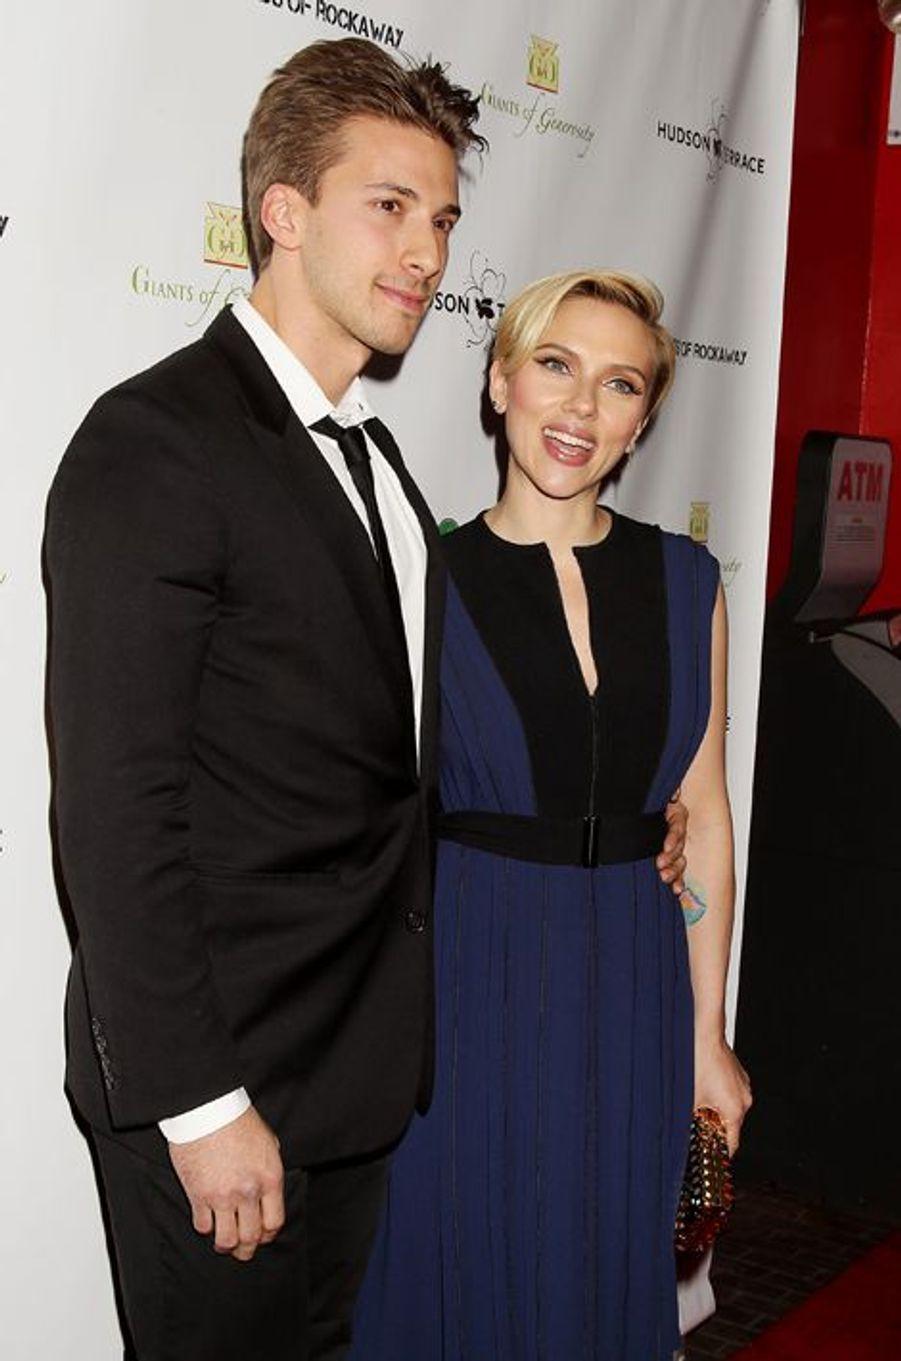 Hunter et Scarlett Johansson à New York le 18 novembre 2014